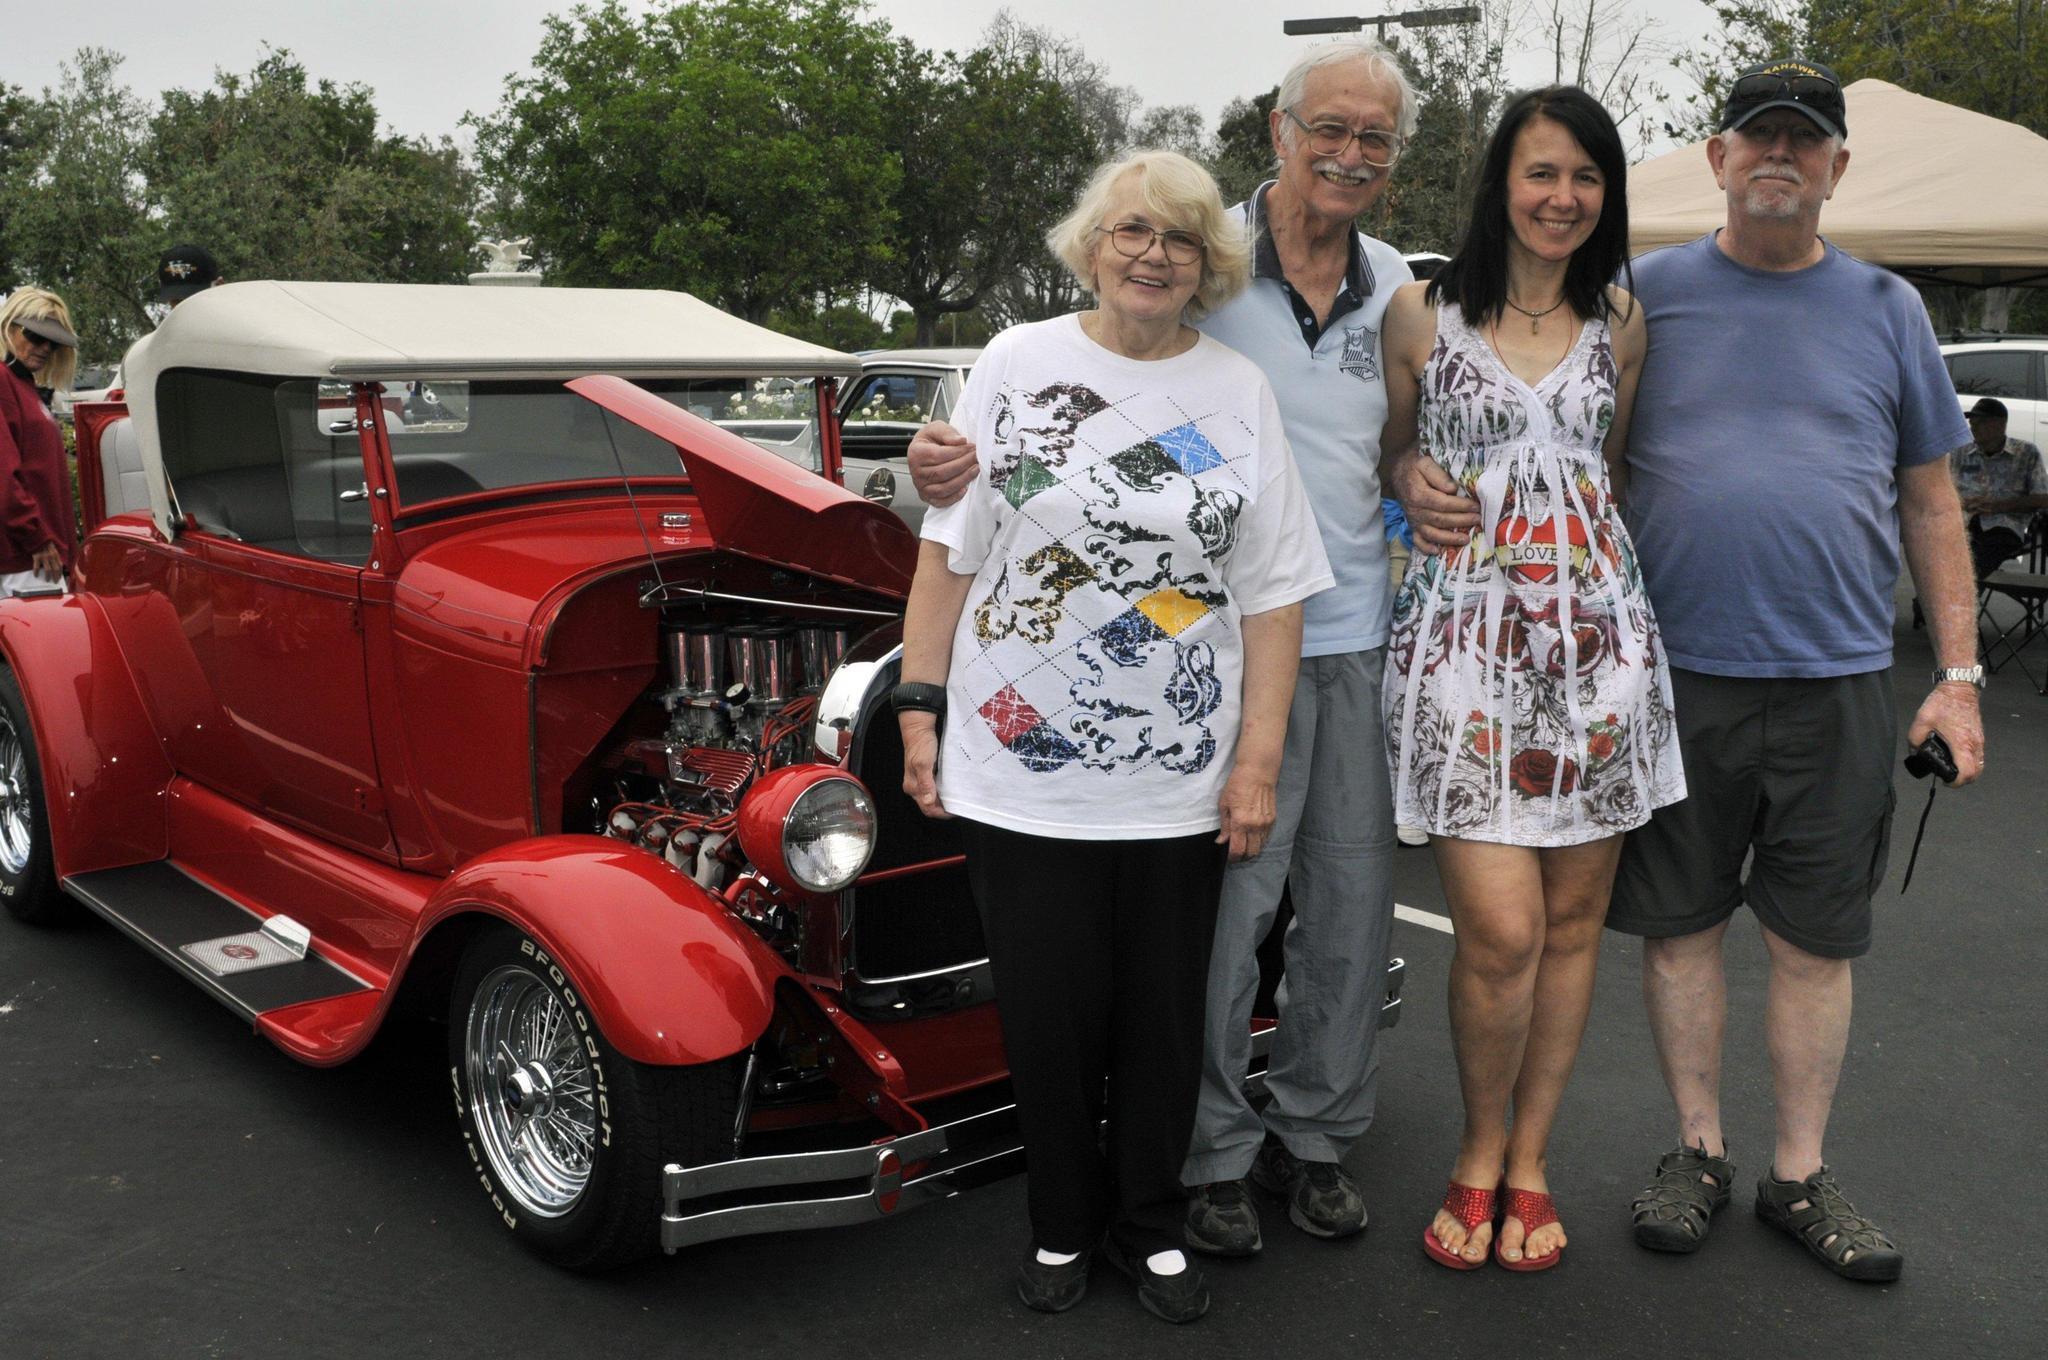 Encinitas Car Show